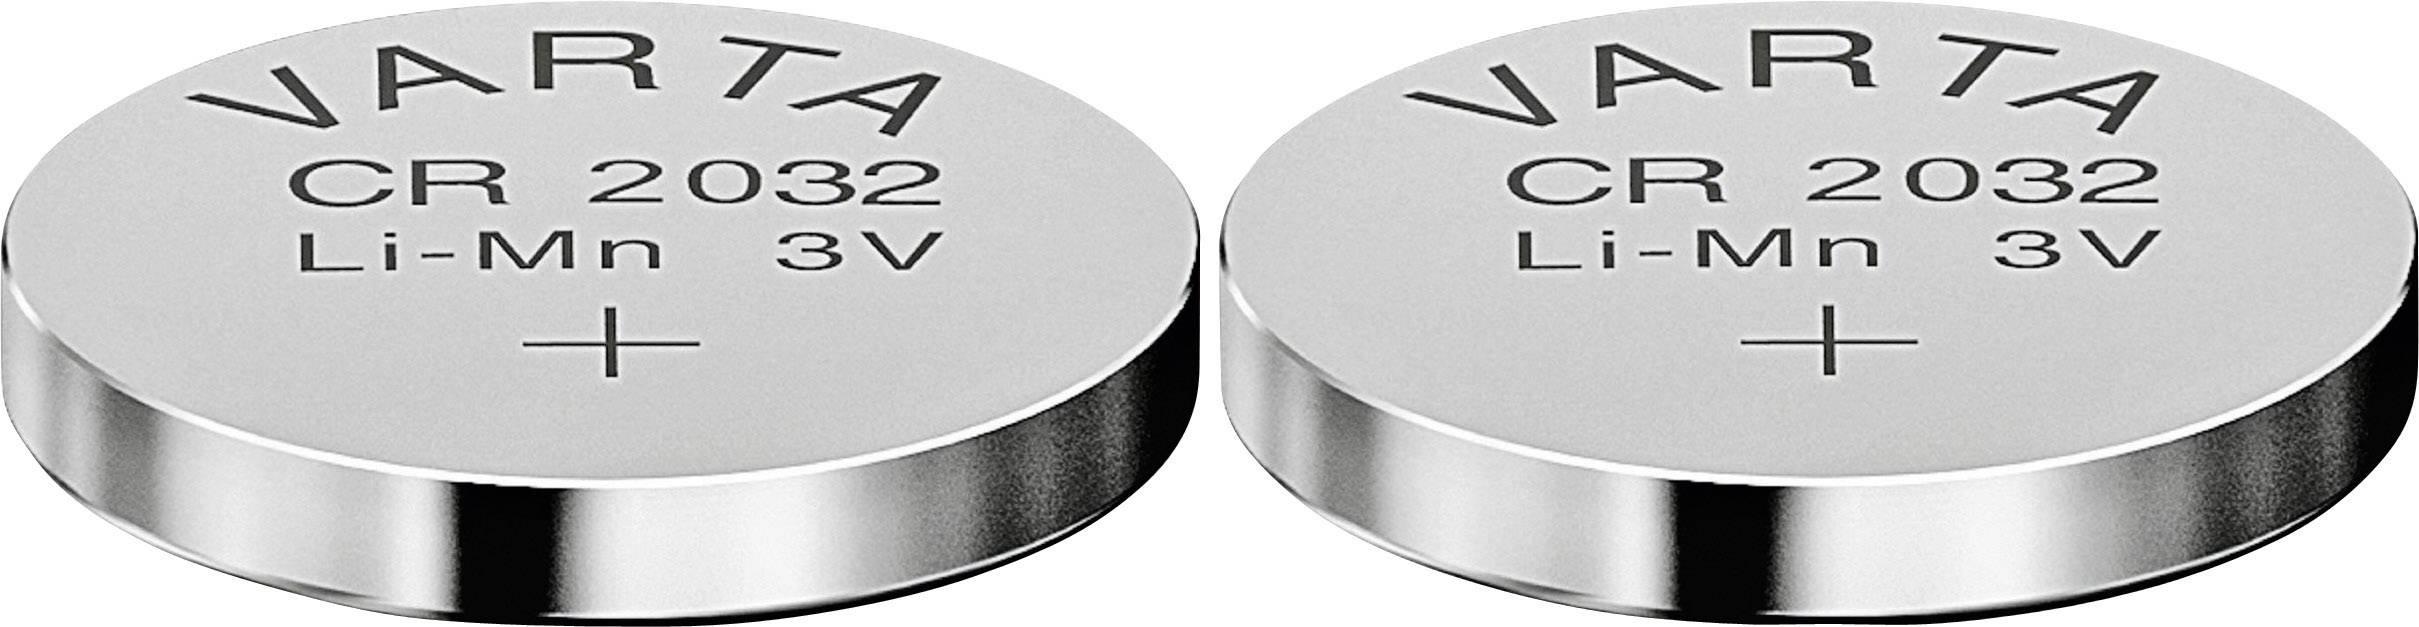 Gombíková batéria Varta CR 2032, lítium, 2 ks, 6032101402